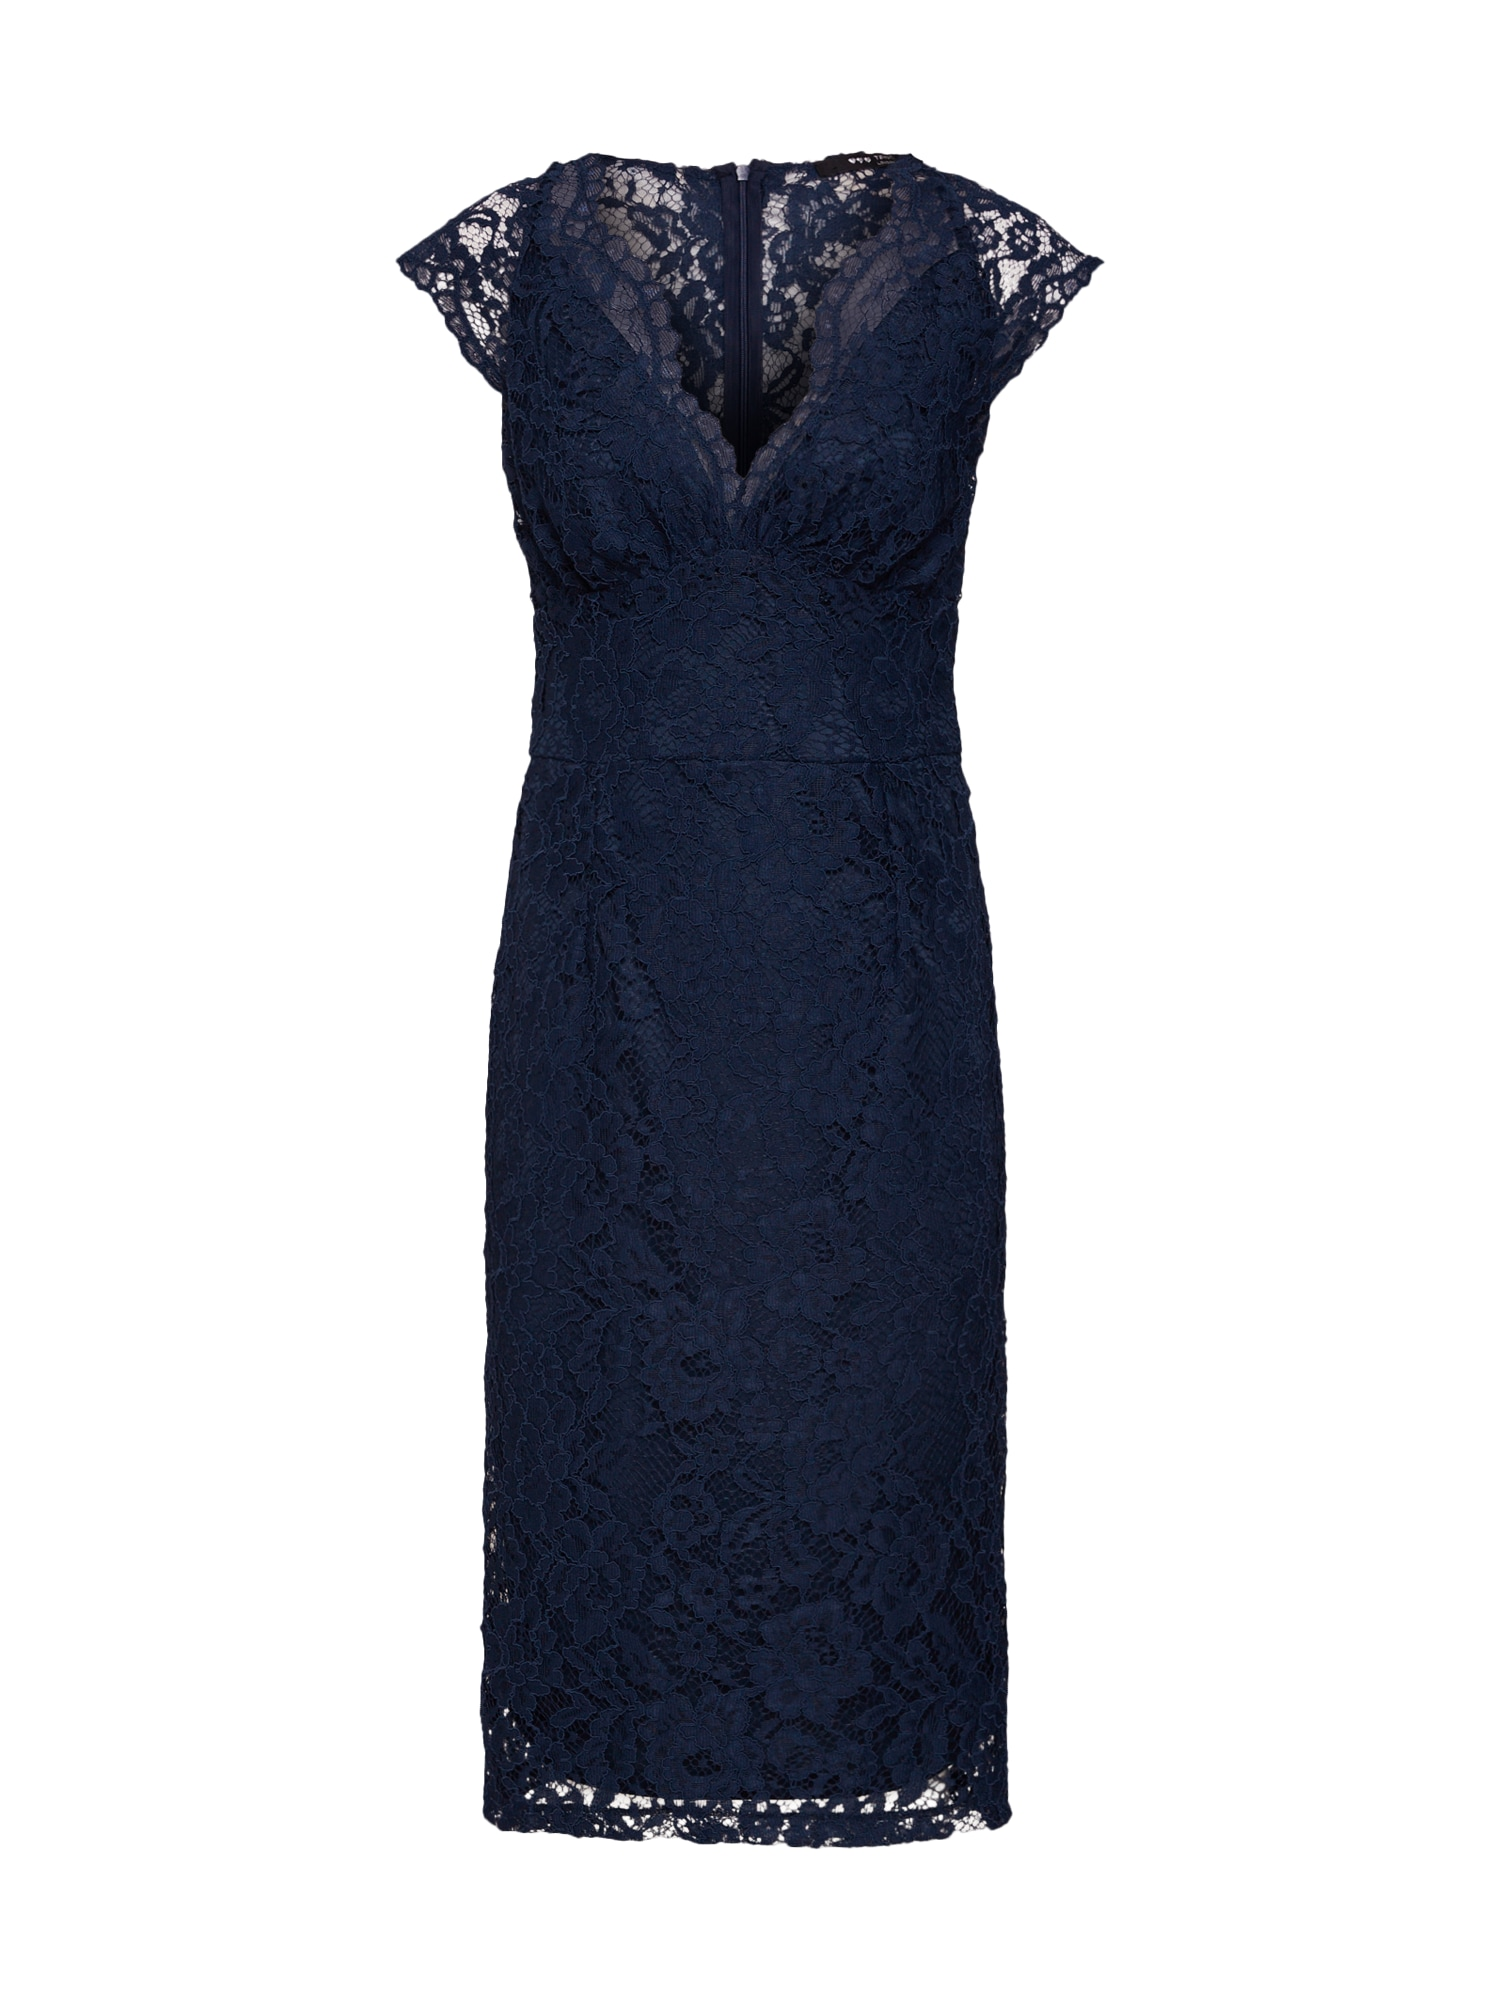 TFNC Sukienka koktajlowa 'JOELY'  kobalt niebieski